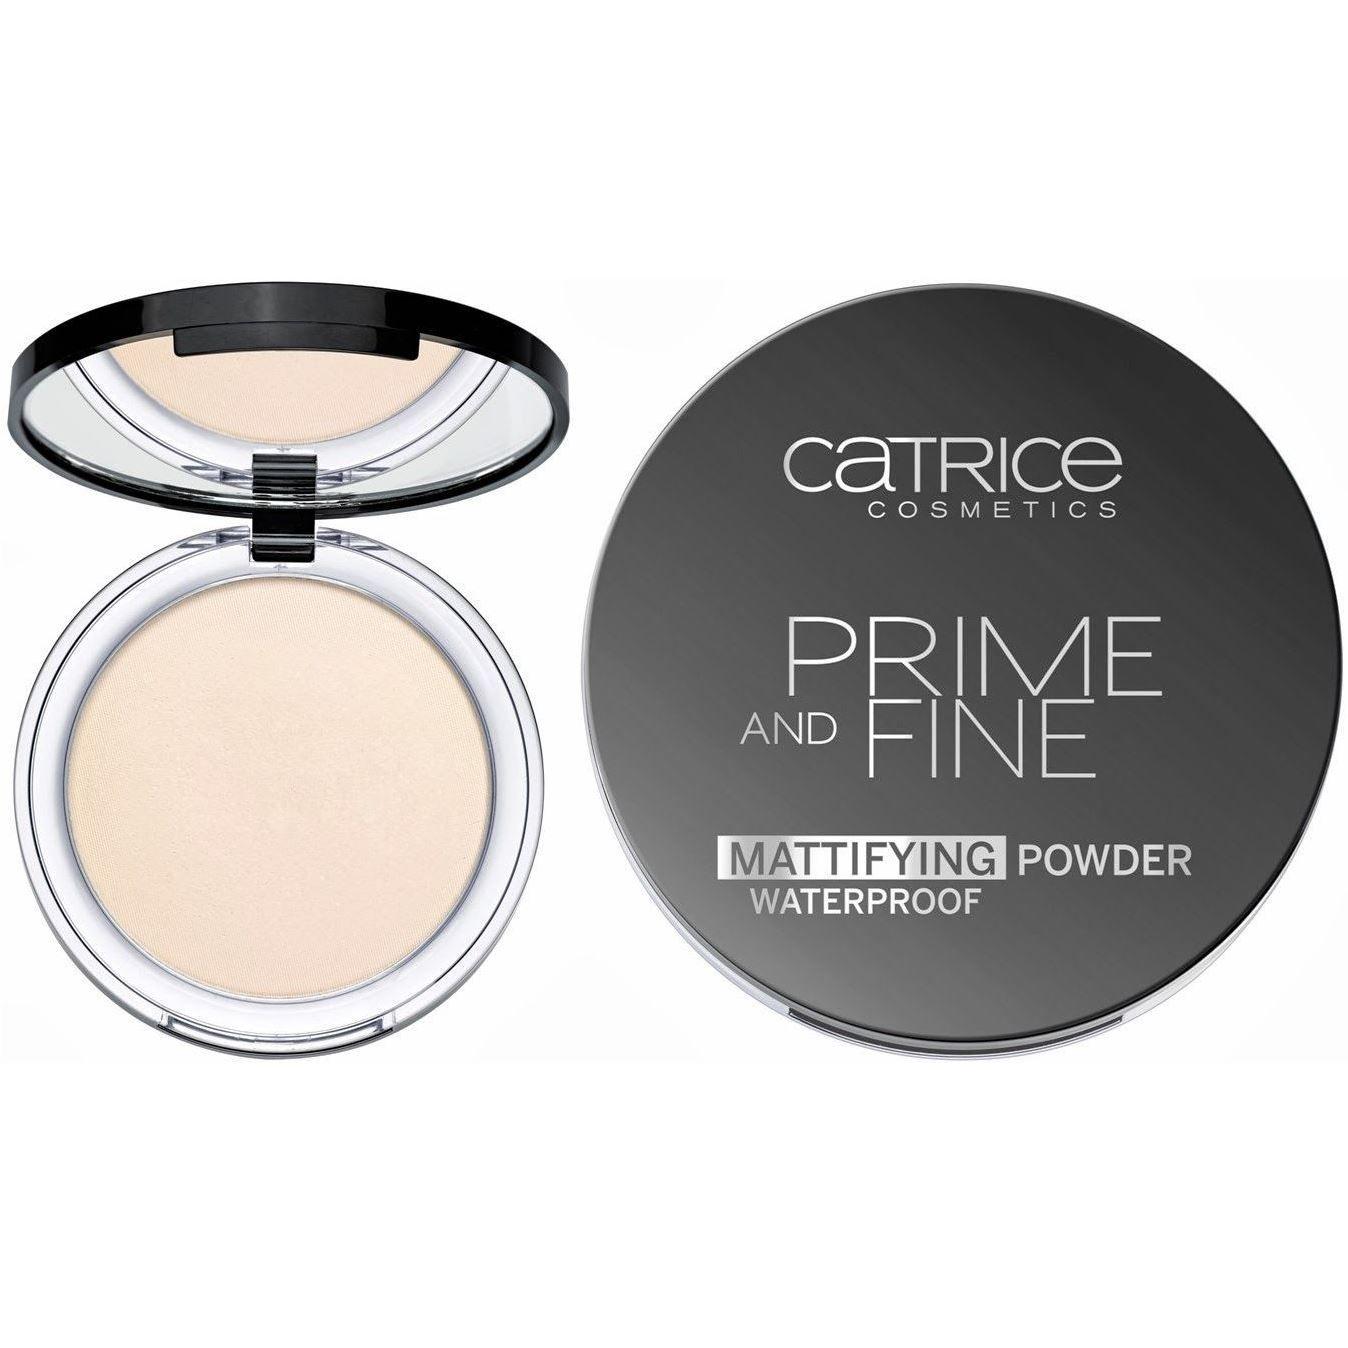 Prime And Fine Mattifying Powder Waterproof